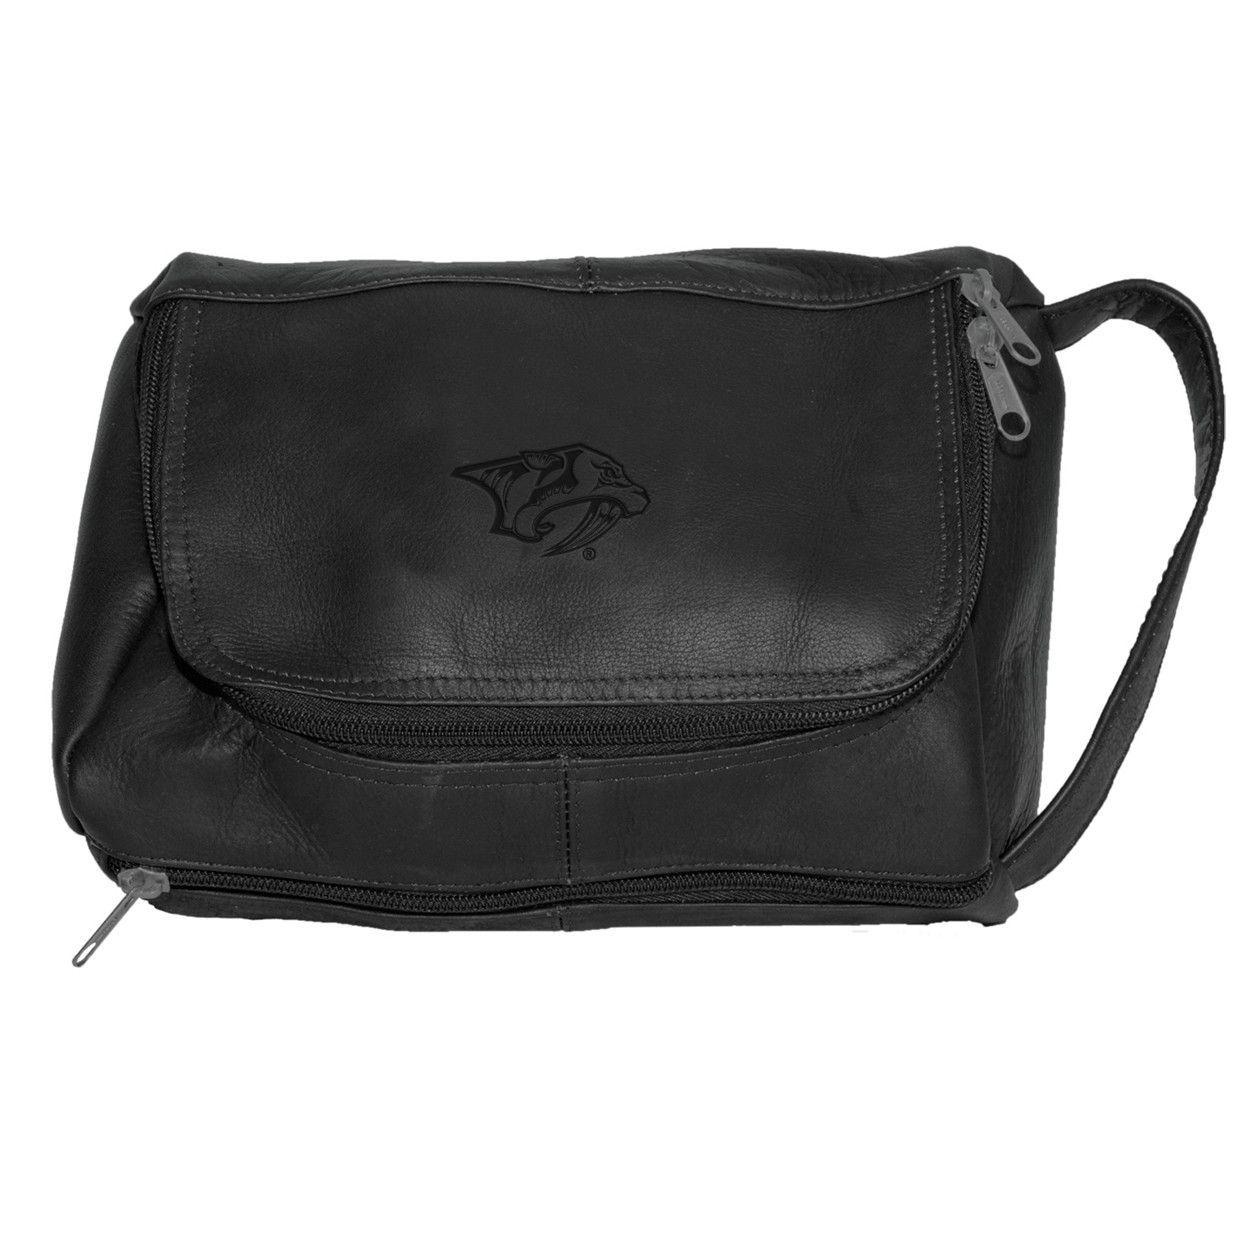 Pangea Black Leather Deluxe Shaving Kit Nashville Predators